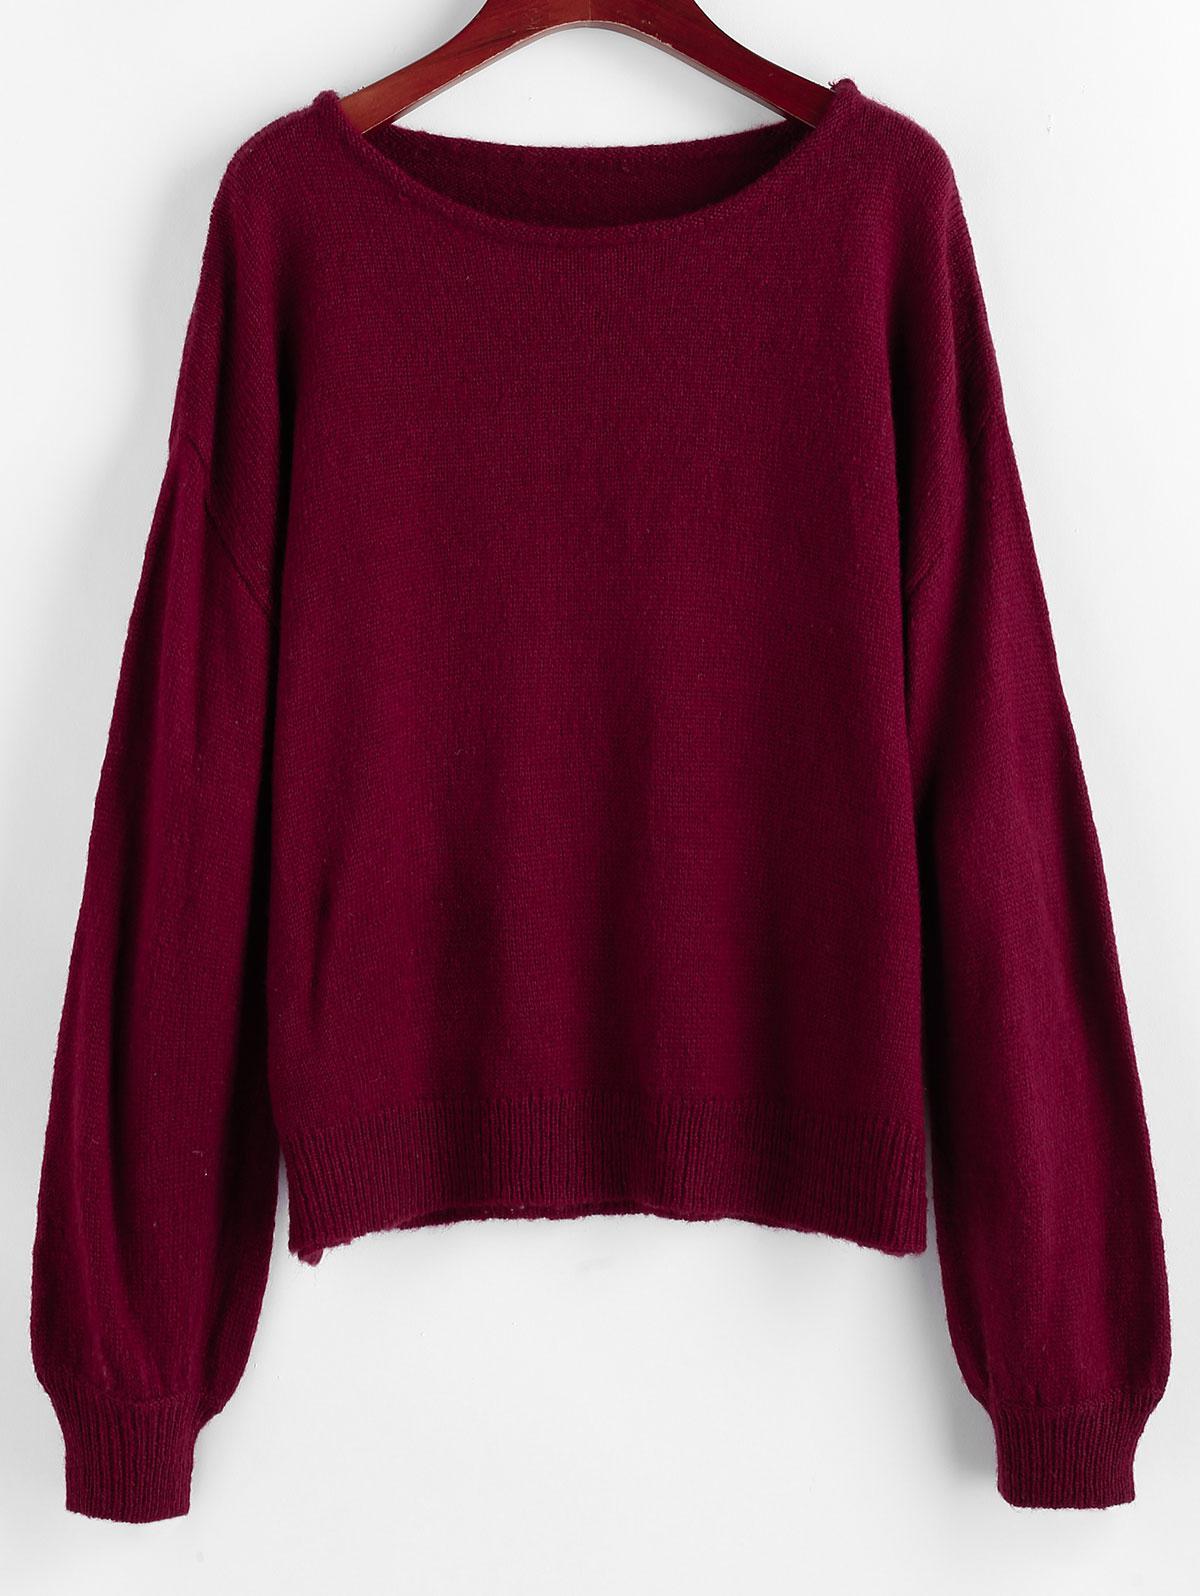 ZAFUL Lantern Sleeve Drop Shoulder Plain Sweater